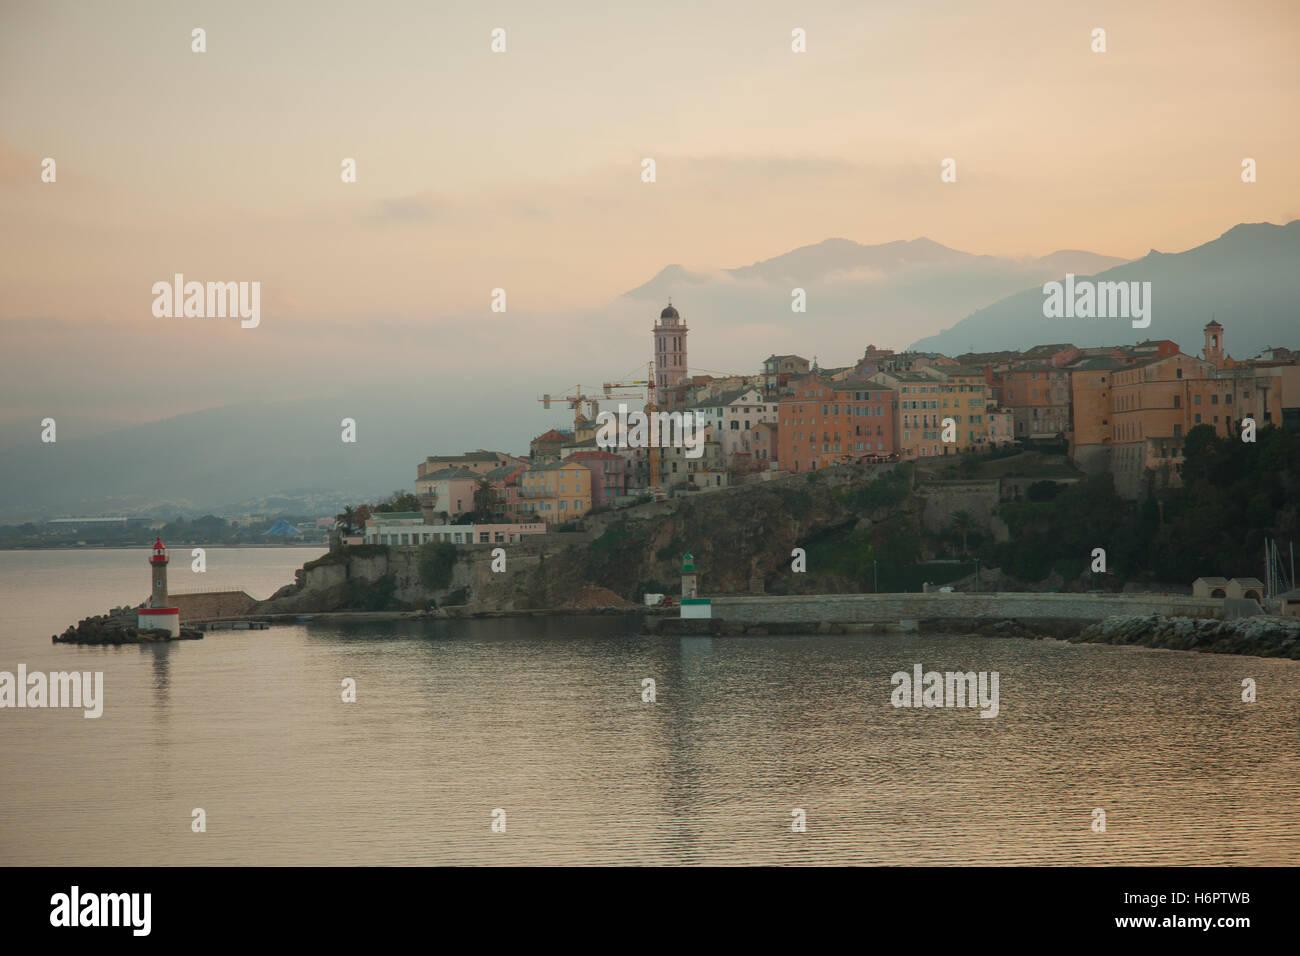 Die Terranova (neues Quartal) bei Sonnenuntergang in Bastia, Korsika, Frankreich Stockbild